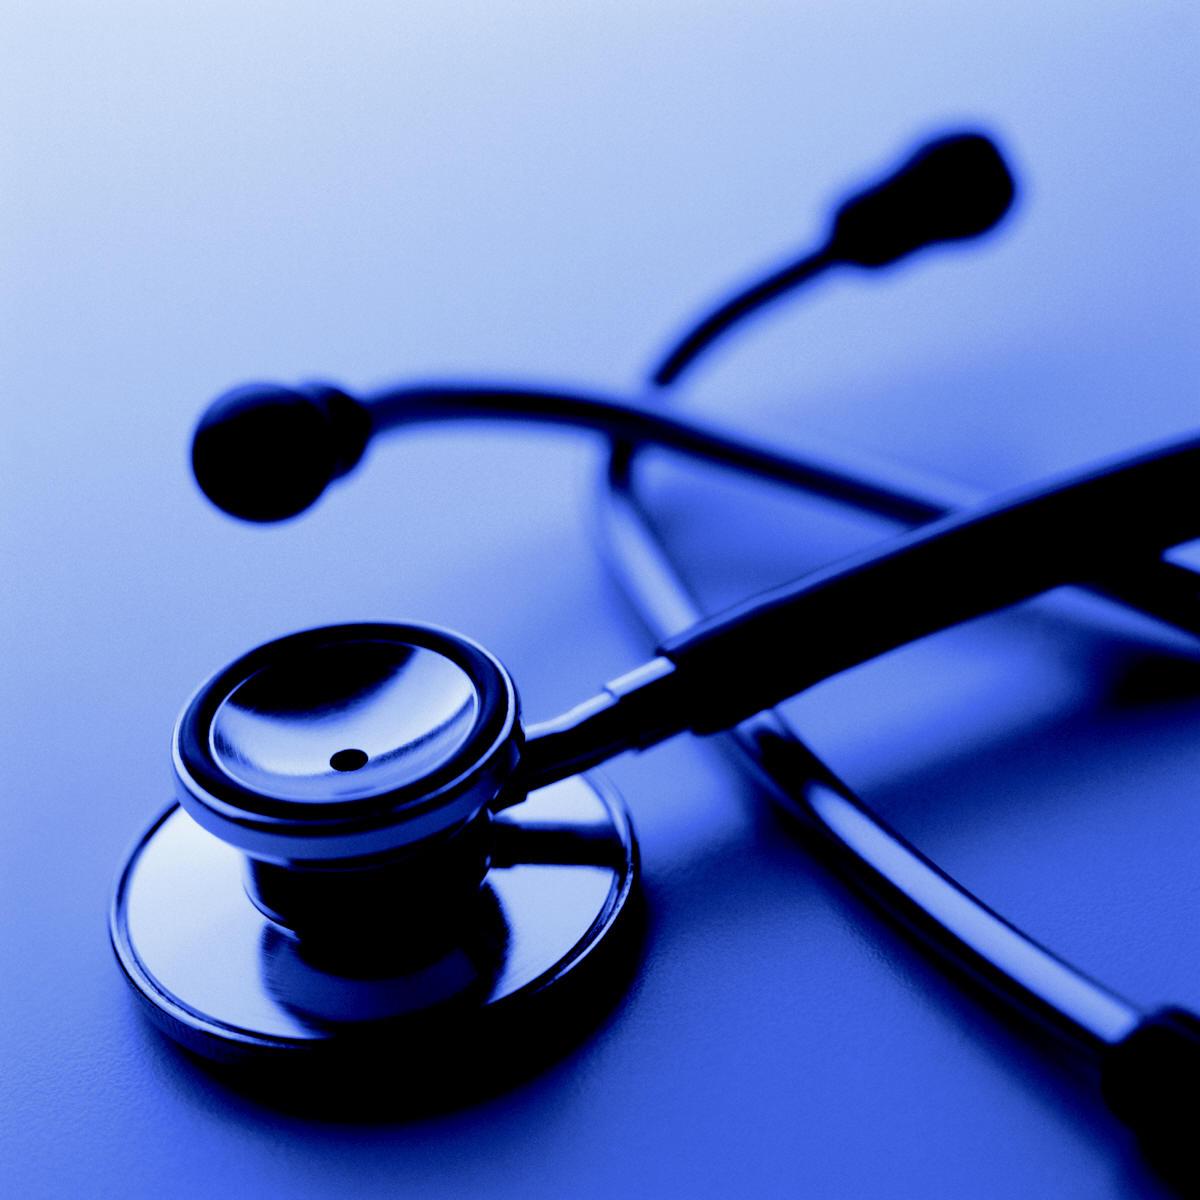 stethoscope blue.jpg